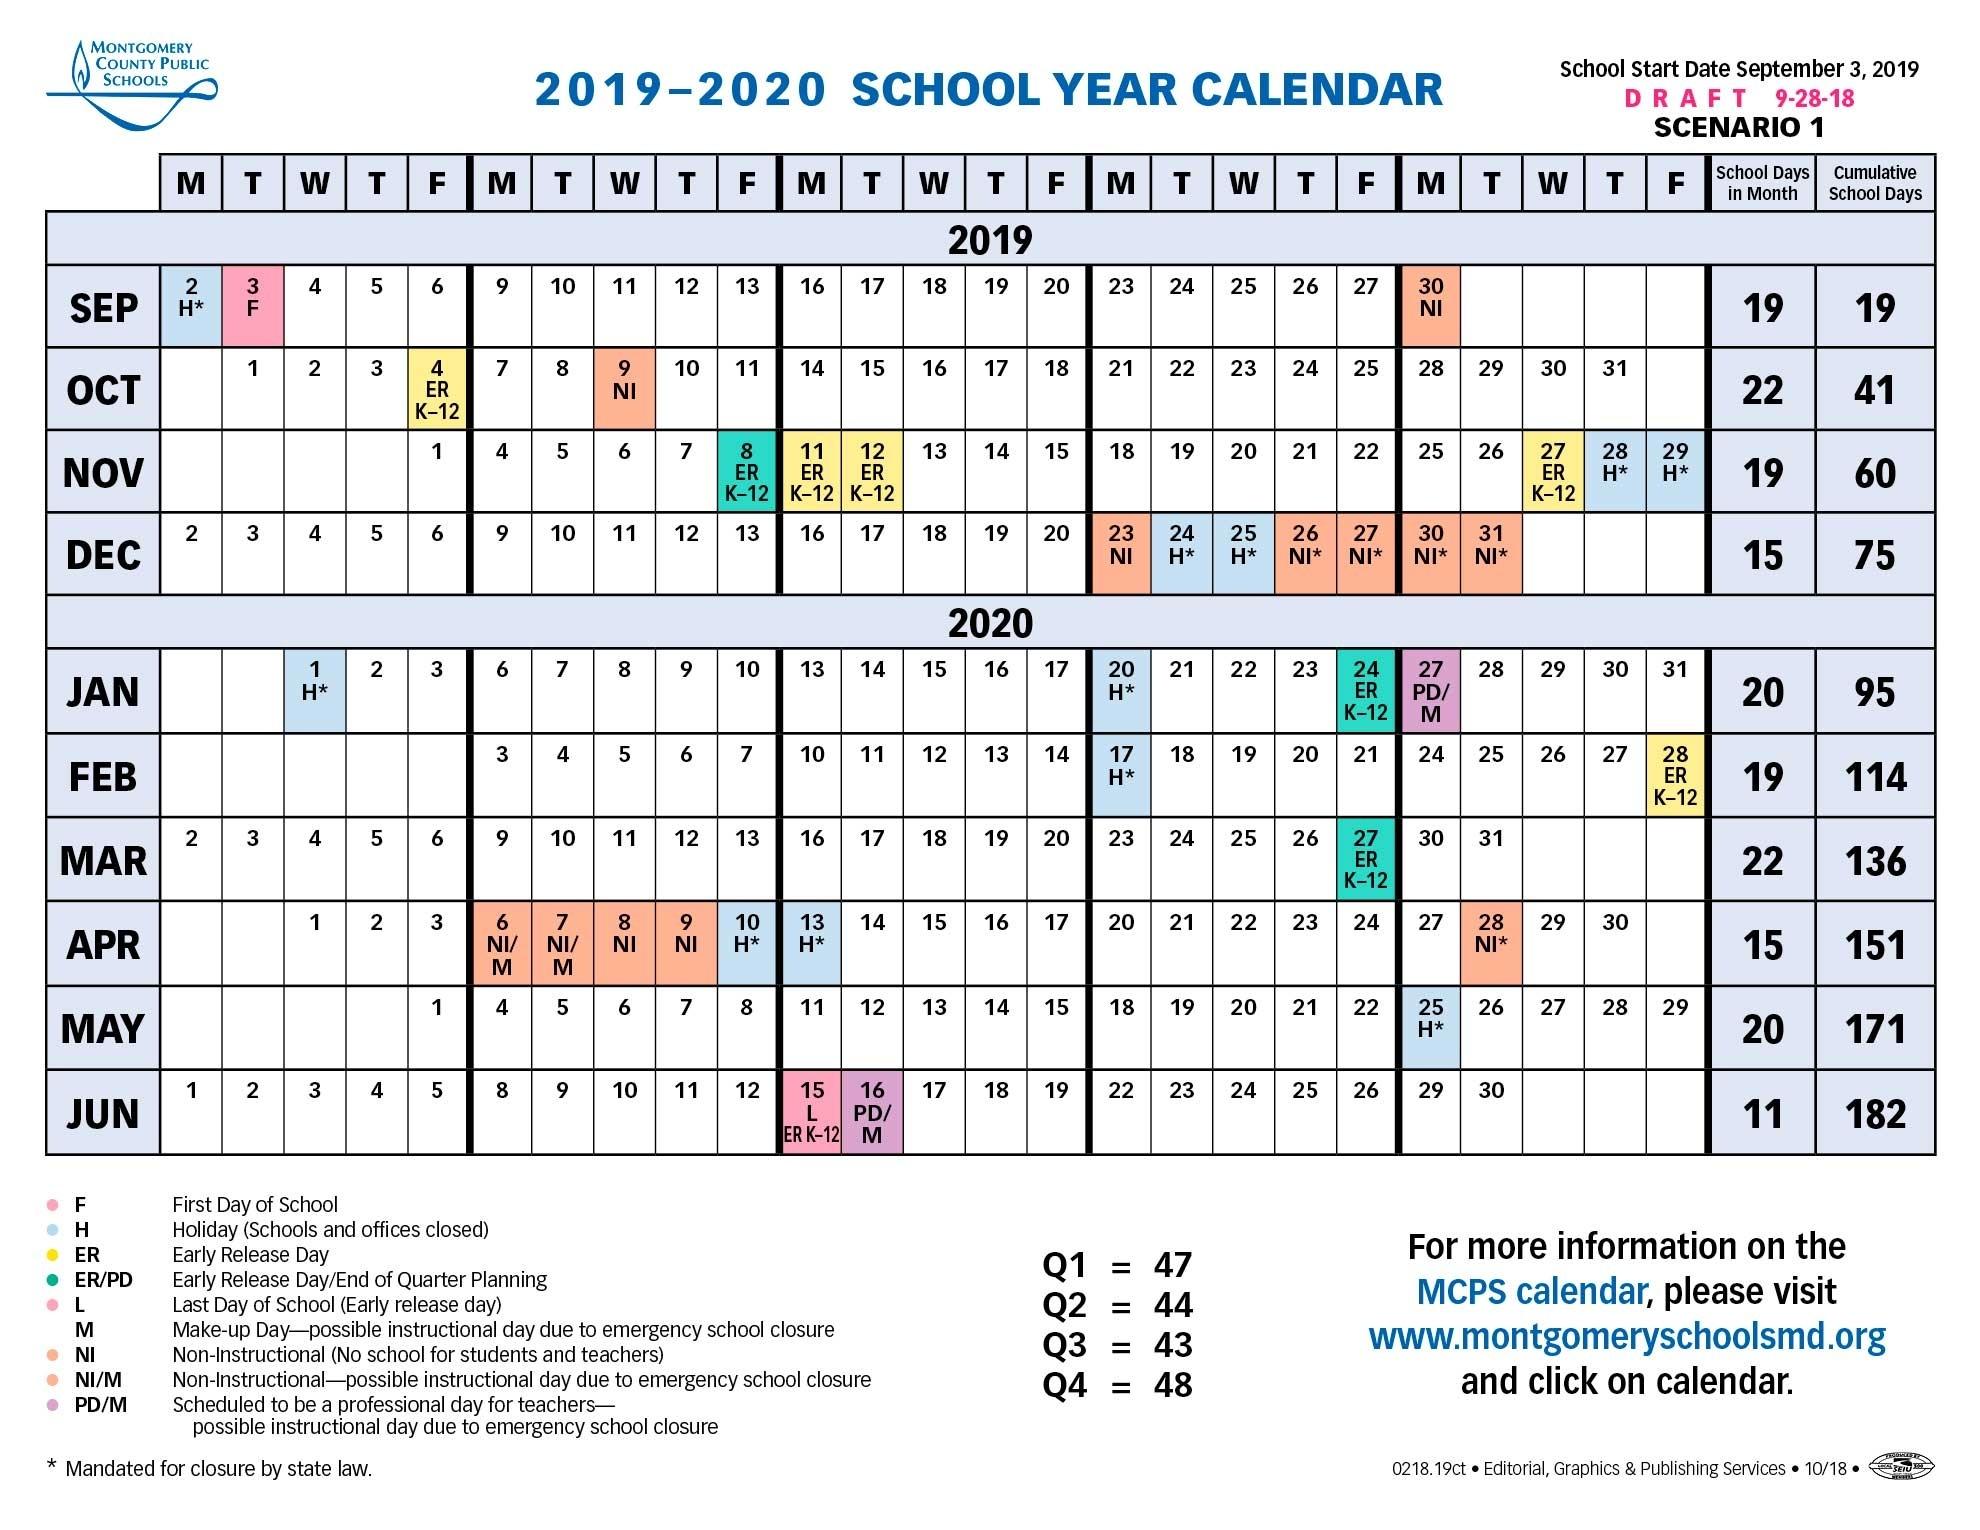 School Board Approves Longer Spring Break For 2019-2020 Calendar_Calendar School Usa 2020